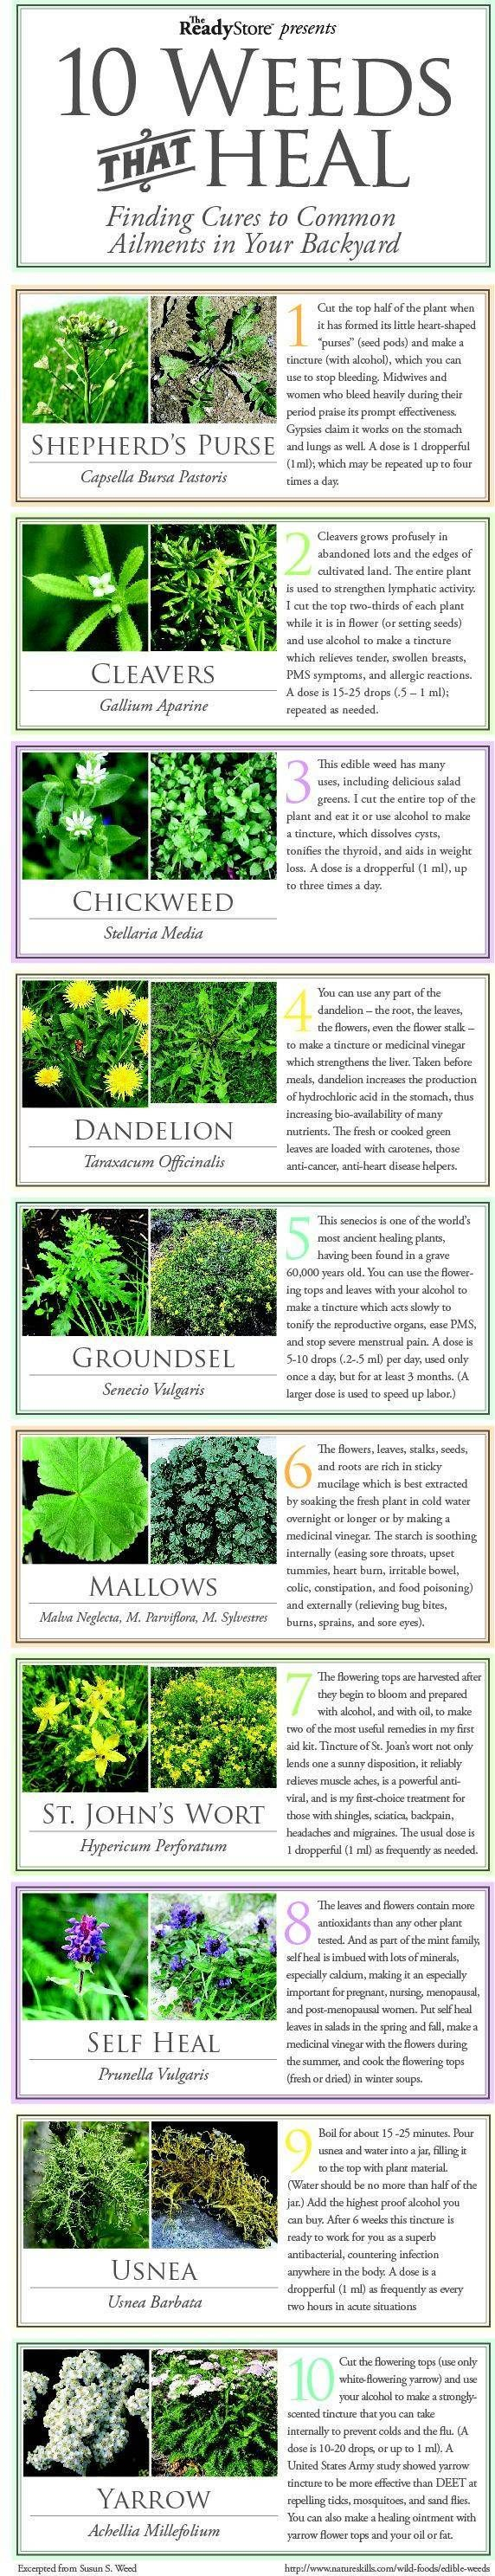 Top 10 Weeds That Heal - INFOGRAPHIC - Shepherd's Purse, Cleavers, Chickweed, Dandelion, Groundsel, Mallows, St. John's Wart, Self Heal, Usnea, Yarrow.